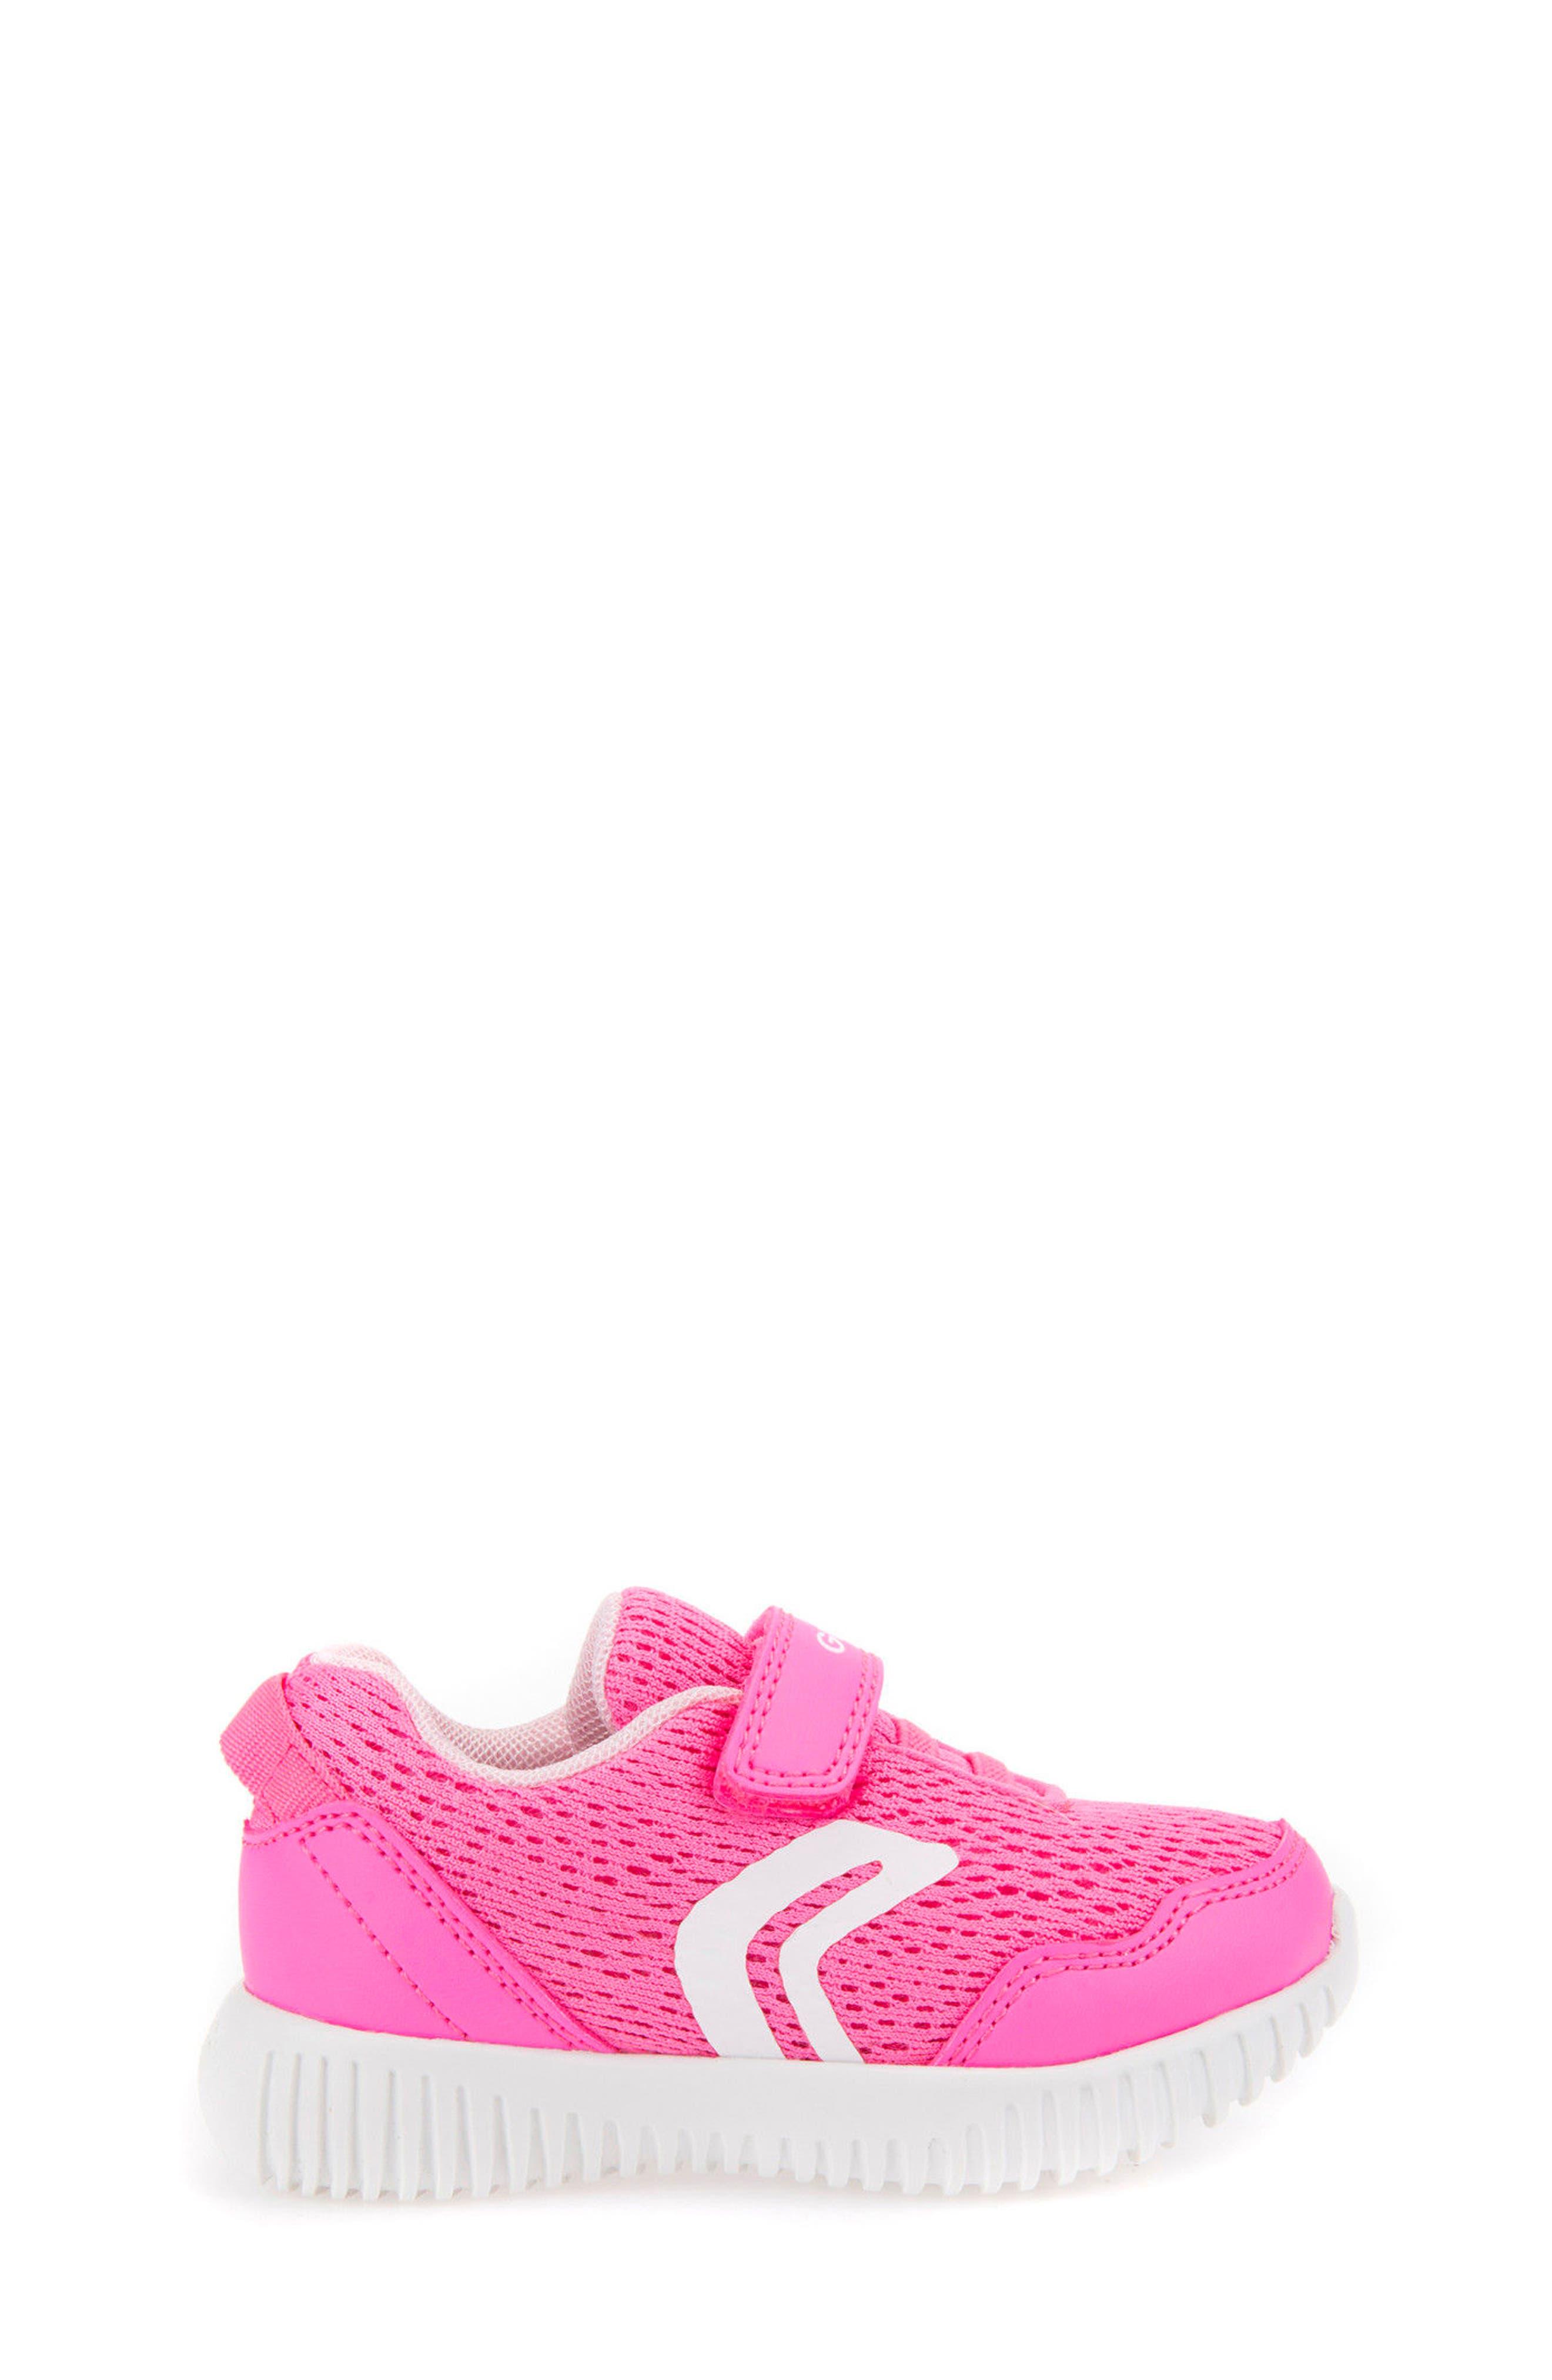 Waviness Sneaker,                             Alternate thumbnail 3, color,                             Fluorescent Fuchsia